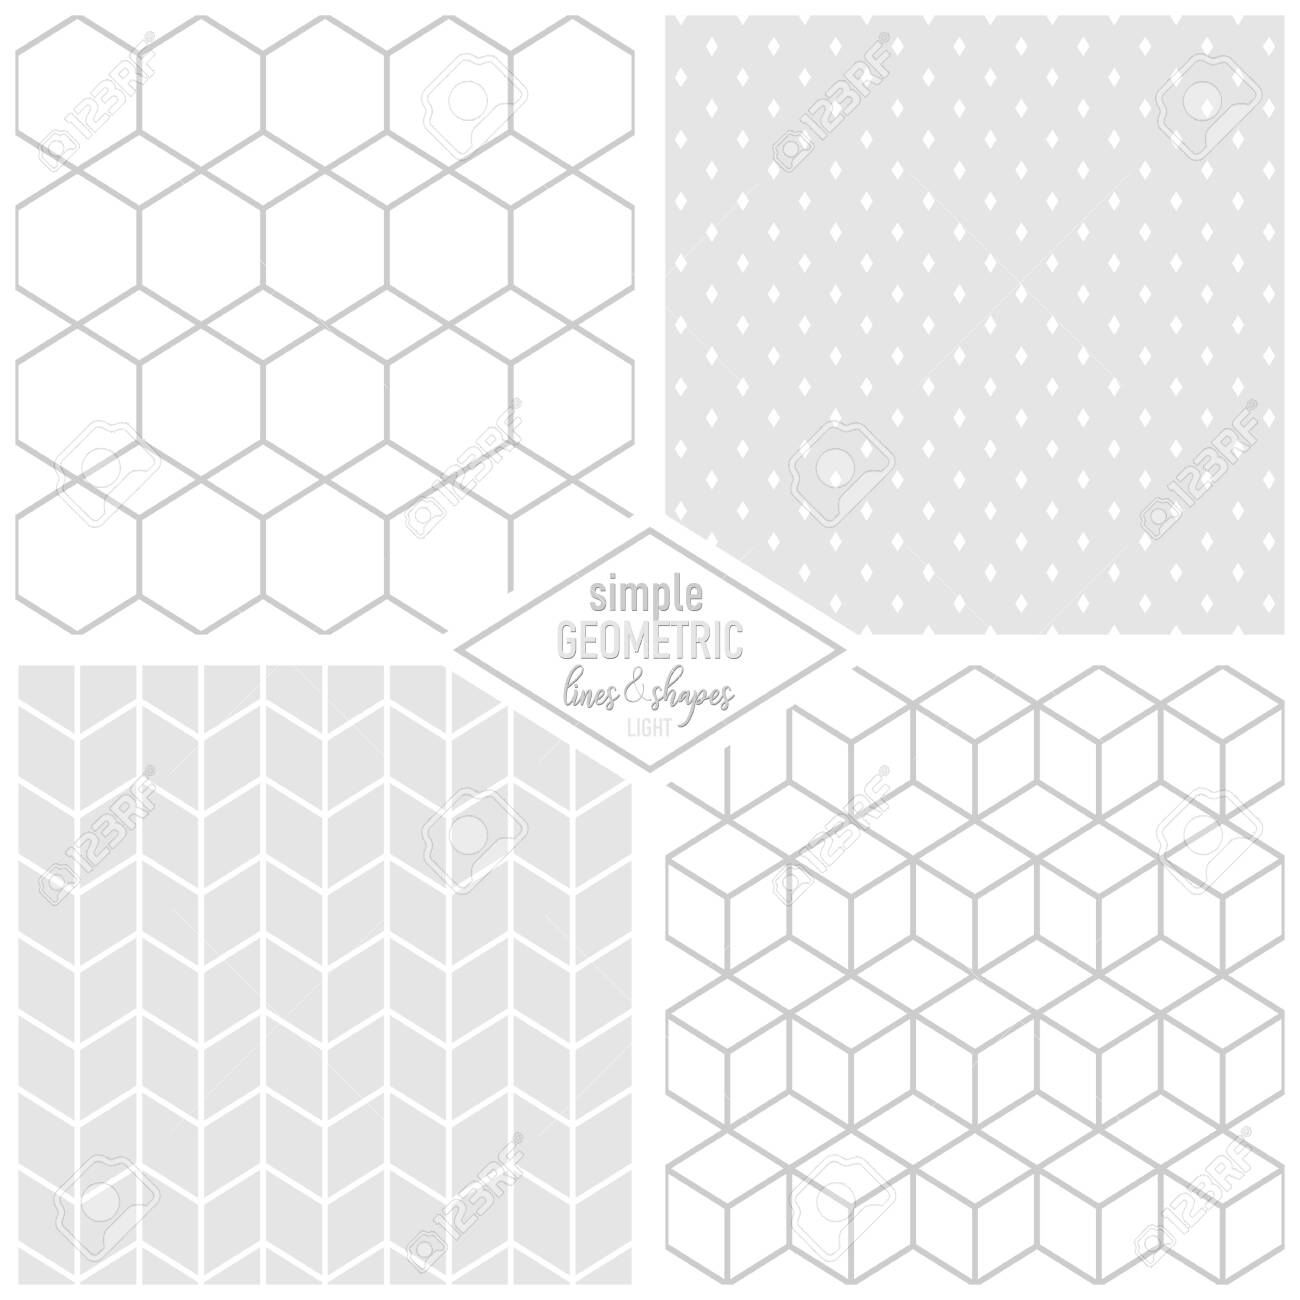 elegant geometric simple lines and shapes hexagons cubes diamonds monochrome light background seamless pattern set - 124429034